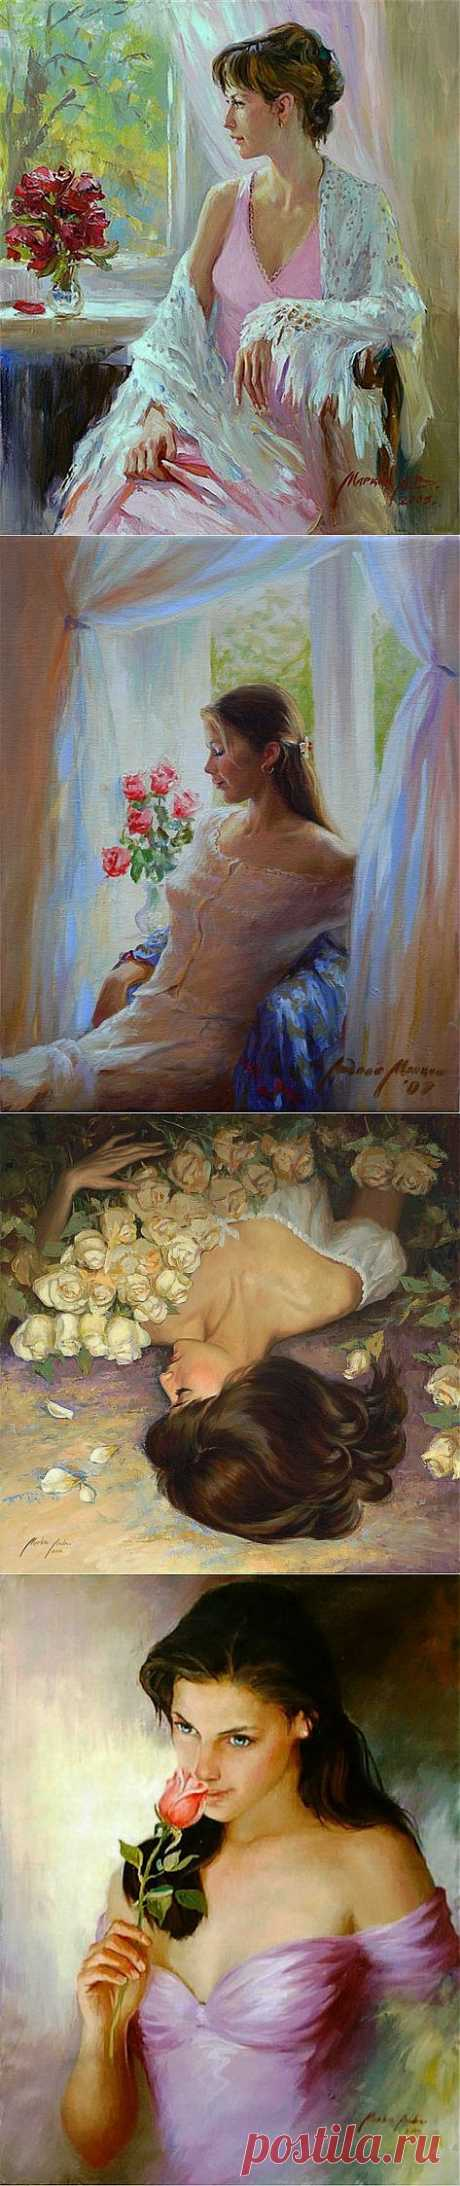 Женские образы на картинах Андрея Маркина